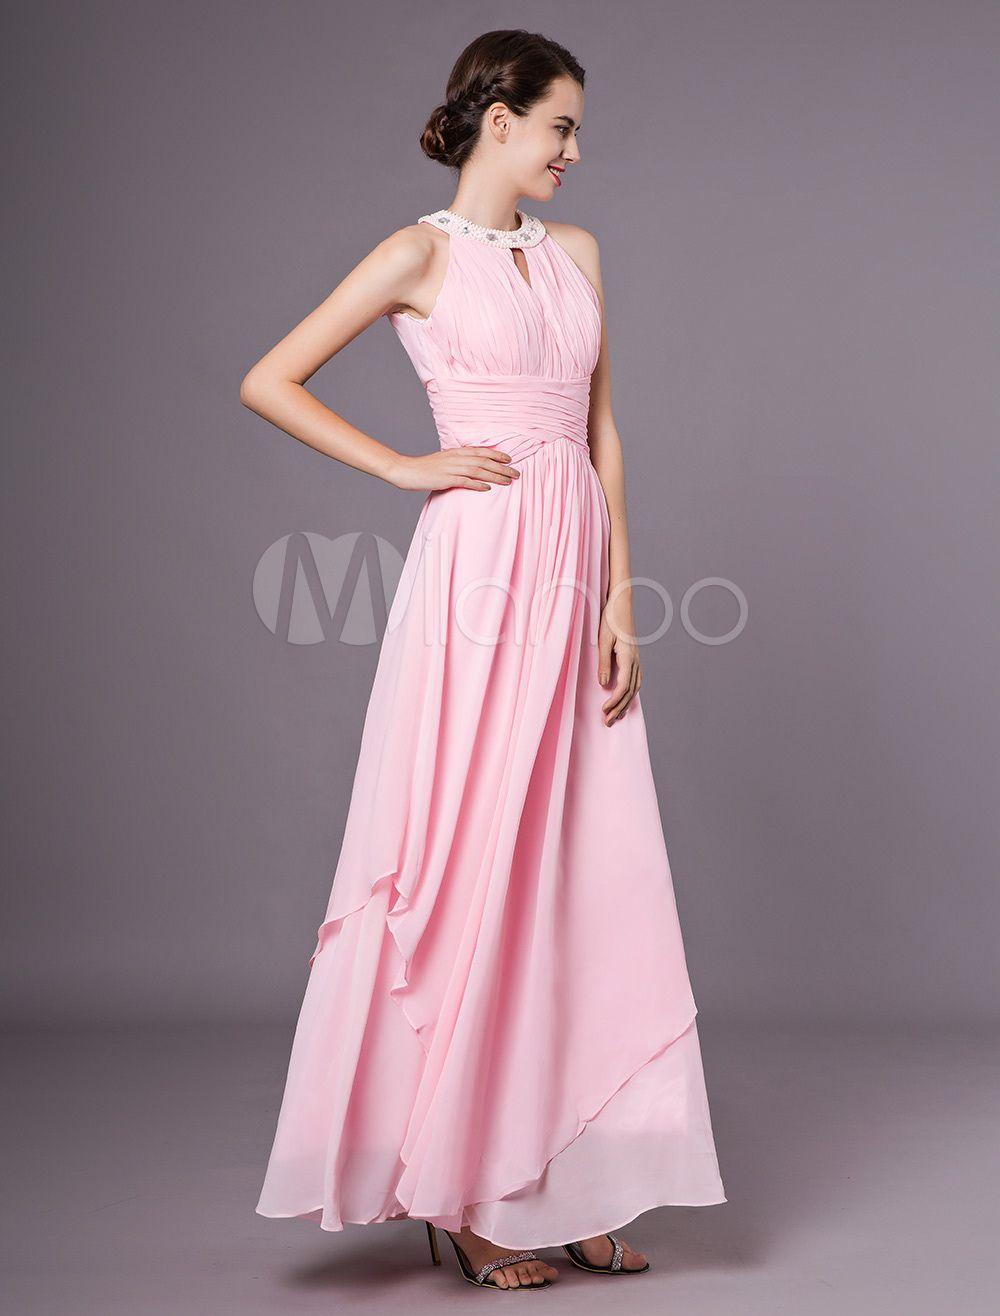 Soft Pink Prom Dresses Halter Chiffon Beaded Keyhole Floor Length